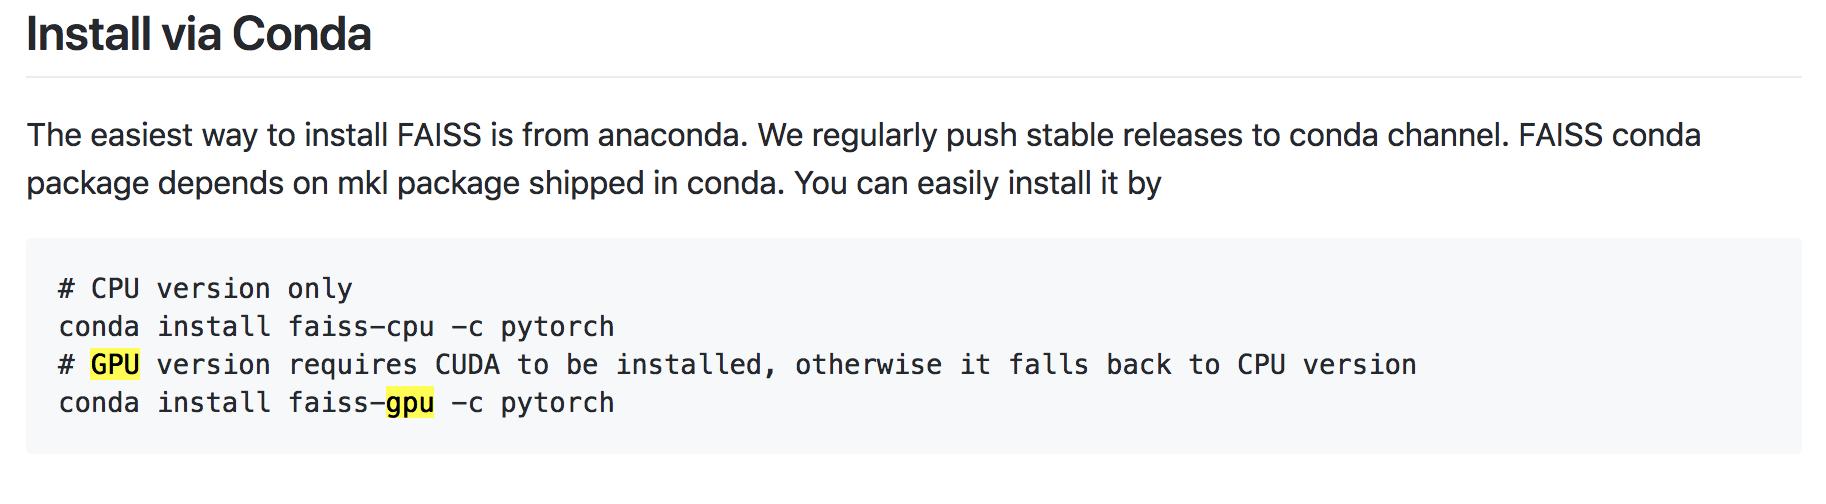 Conda install bayes_opt | BayesOpt: Installing BayesOpt  2019-05-01